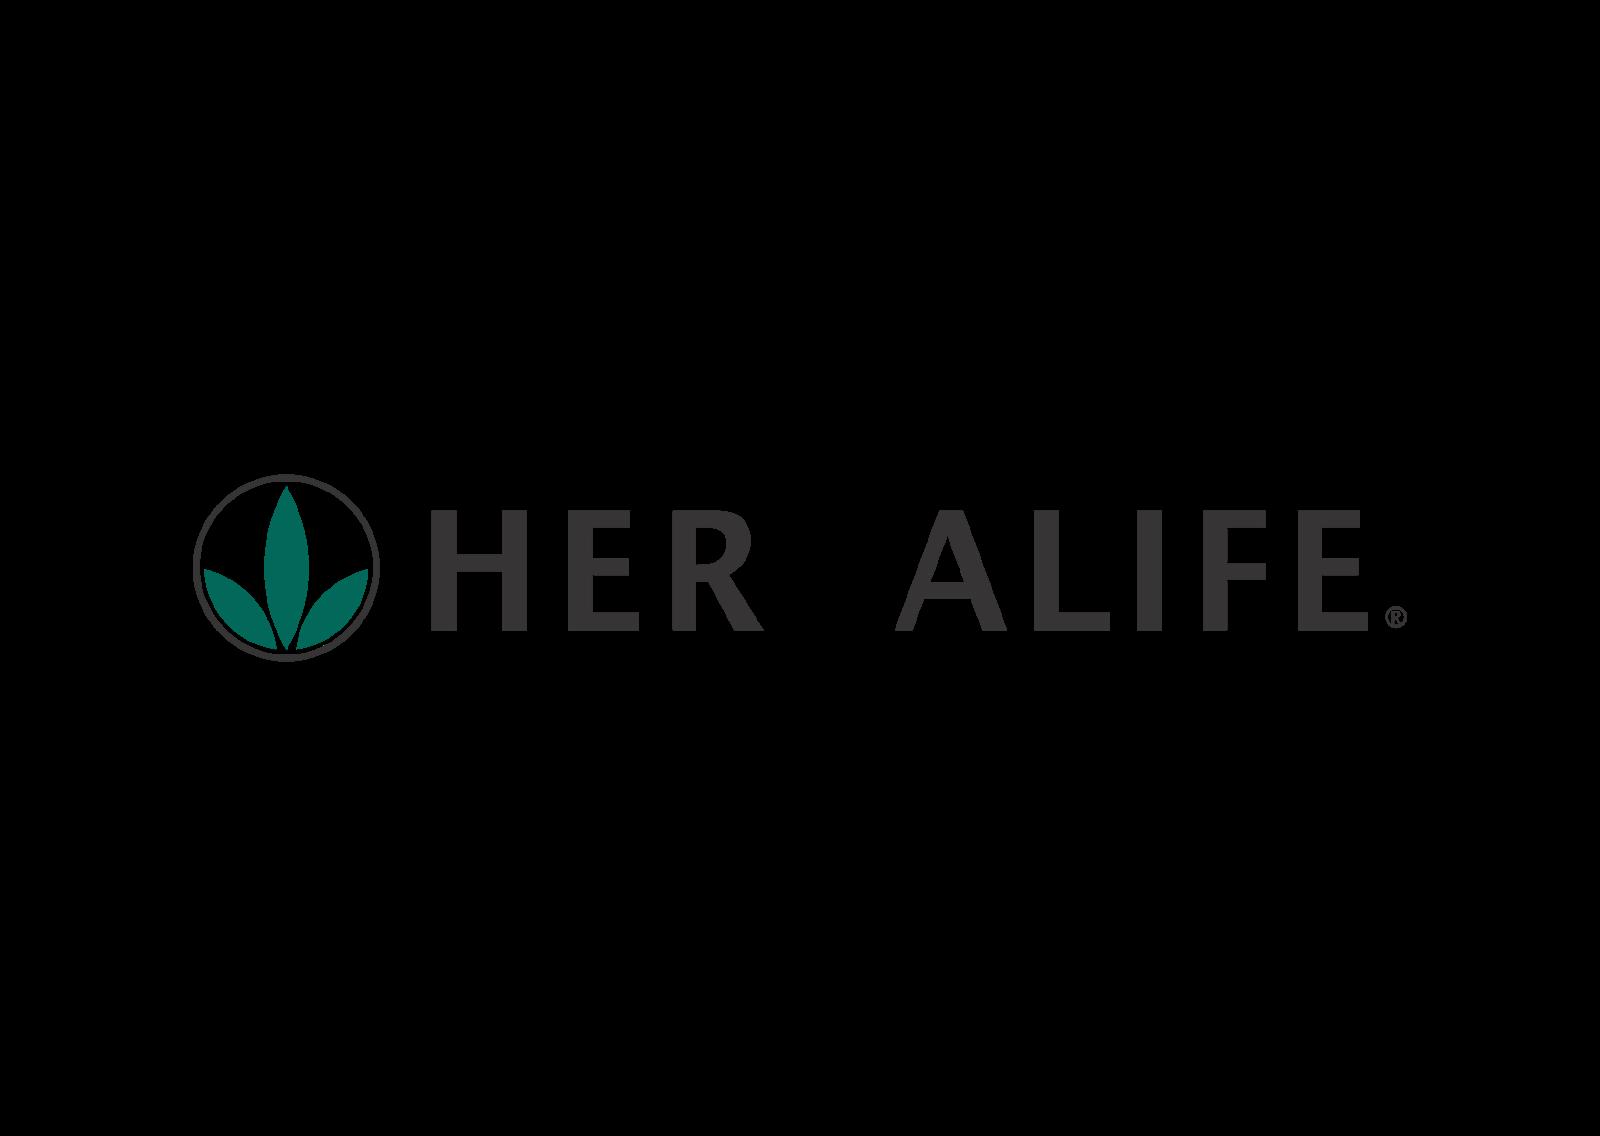 Herbalife Logo Vector download free